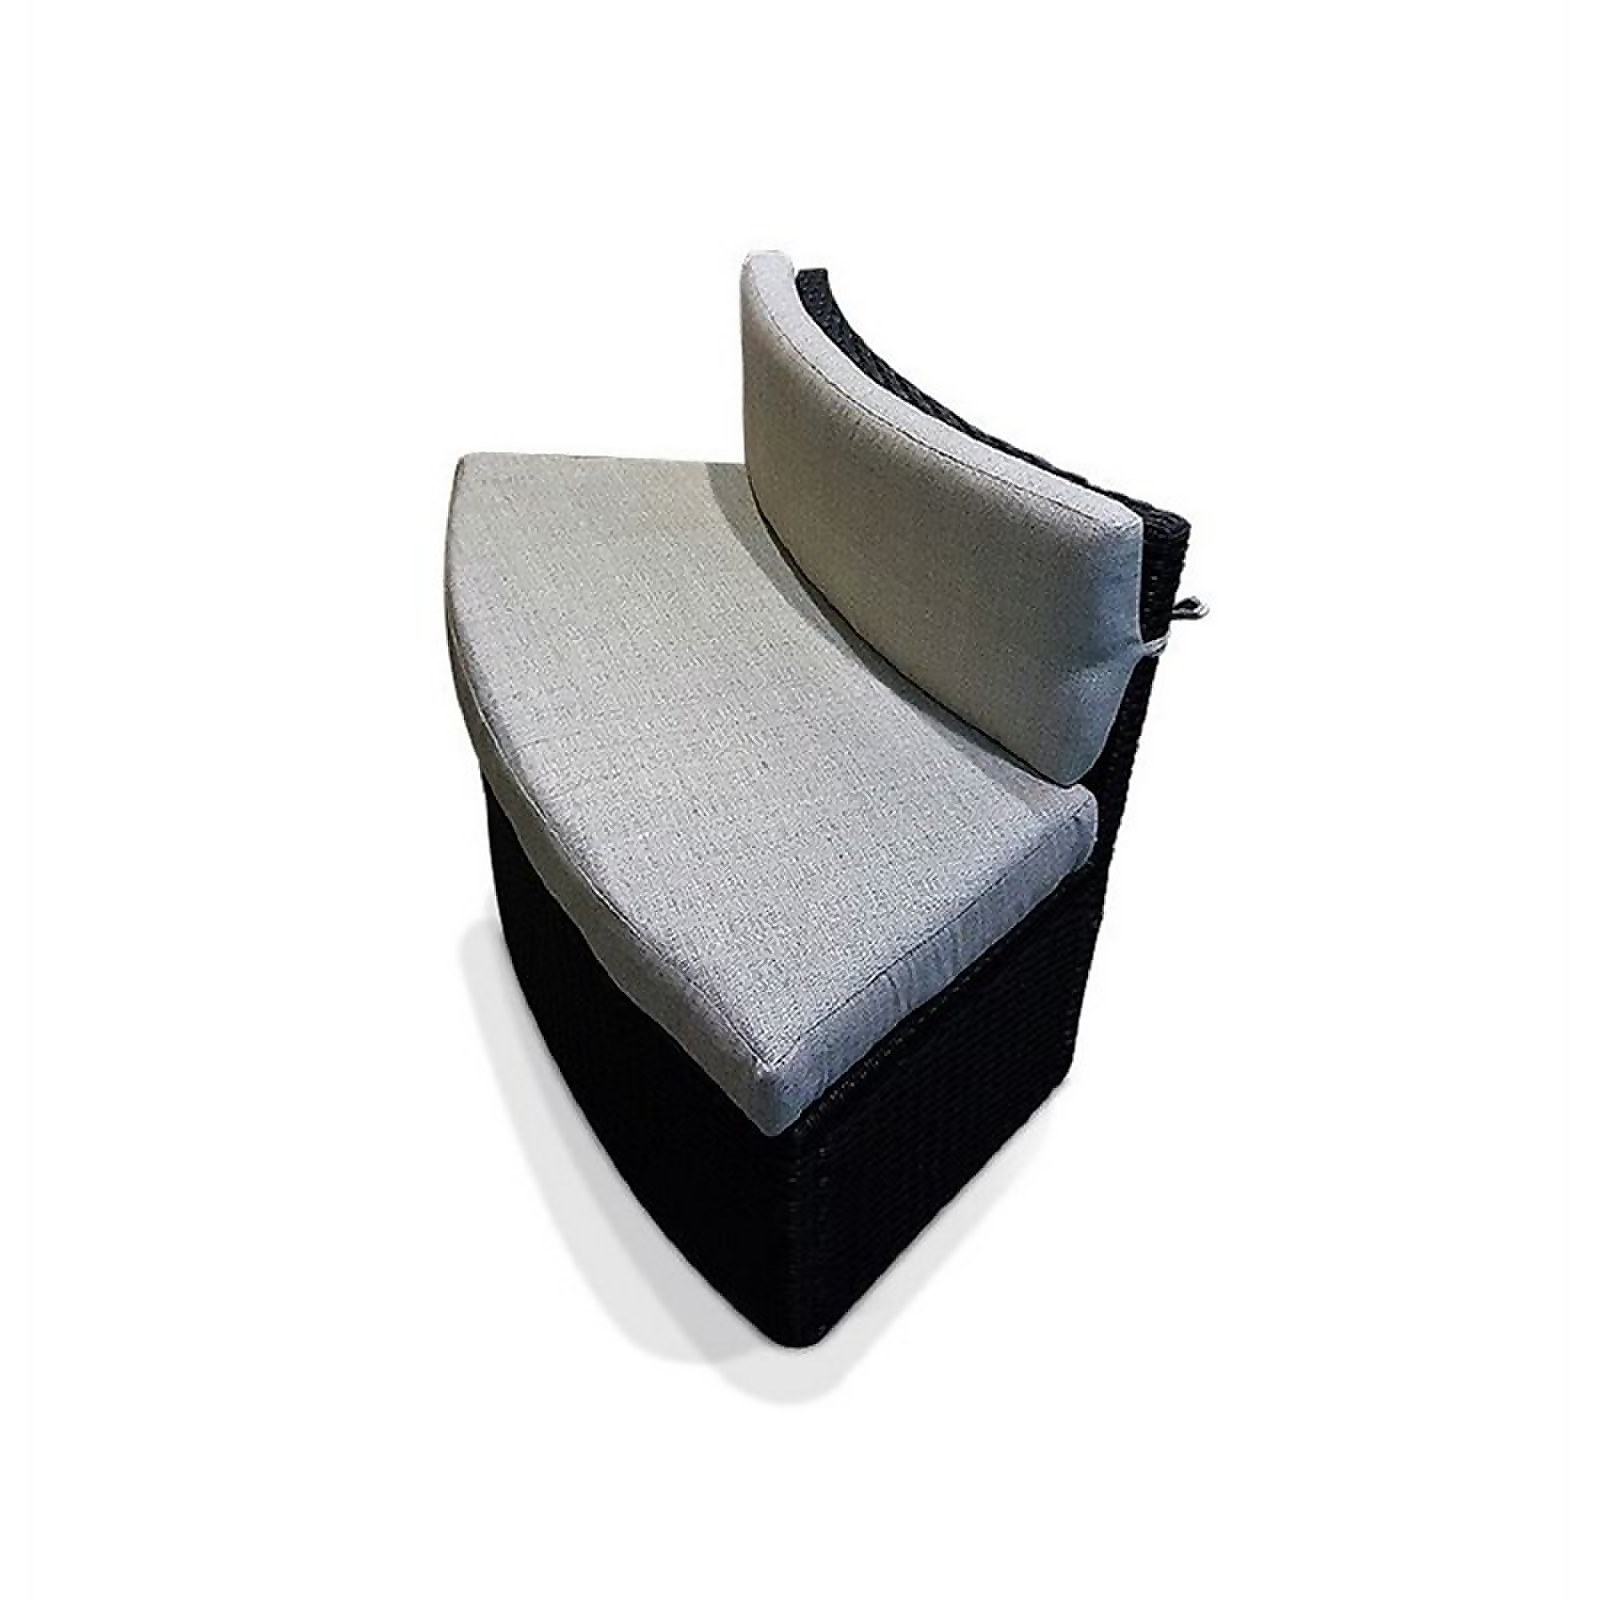 Canadian Spa Rattan Love Seat Sofa with Cushions